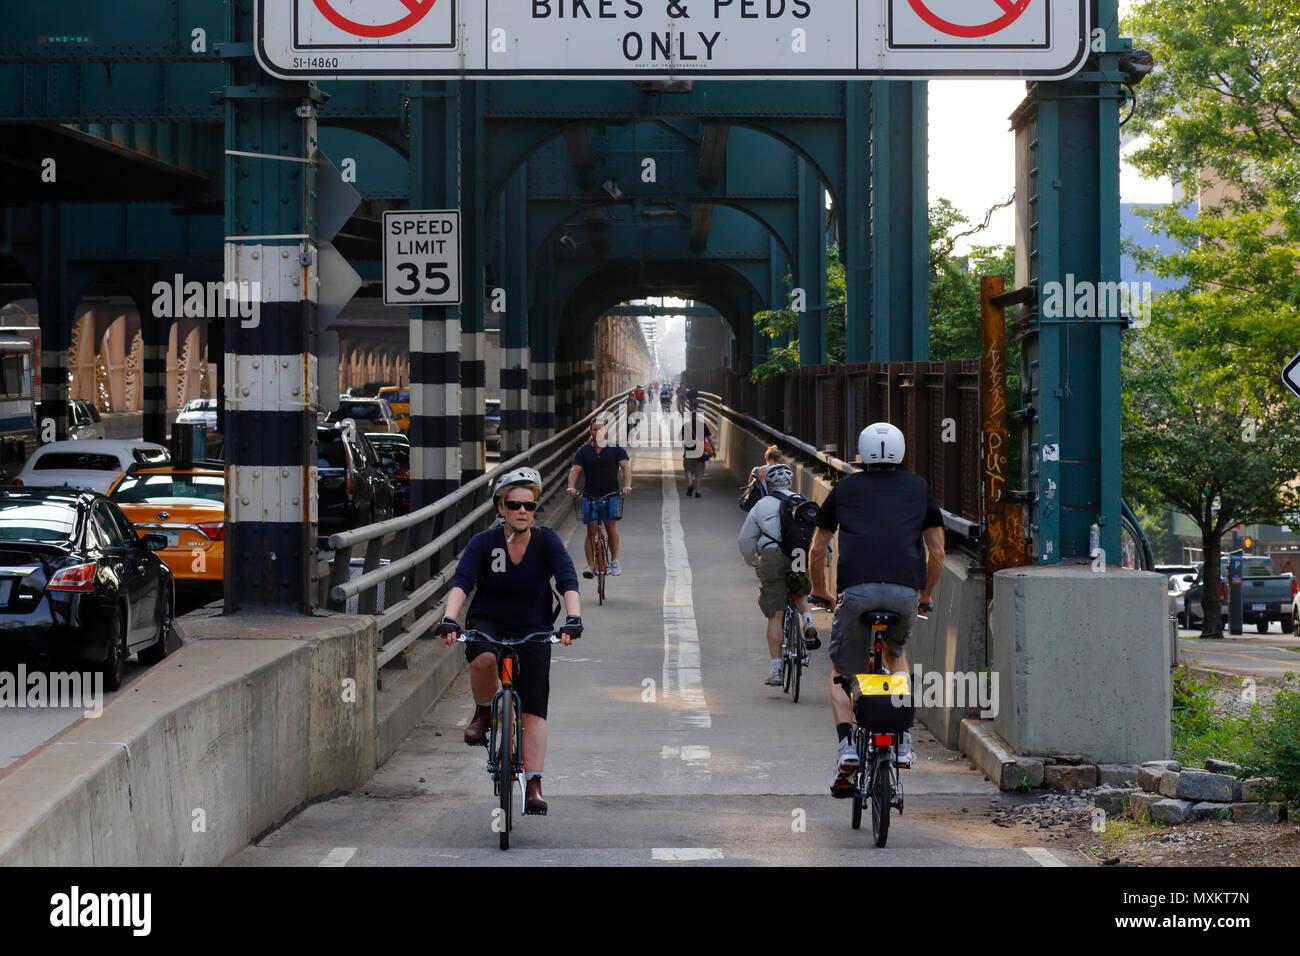 Bicyclists and Pedestrians on the Queensboro Bridge walkway - Stock Image